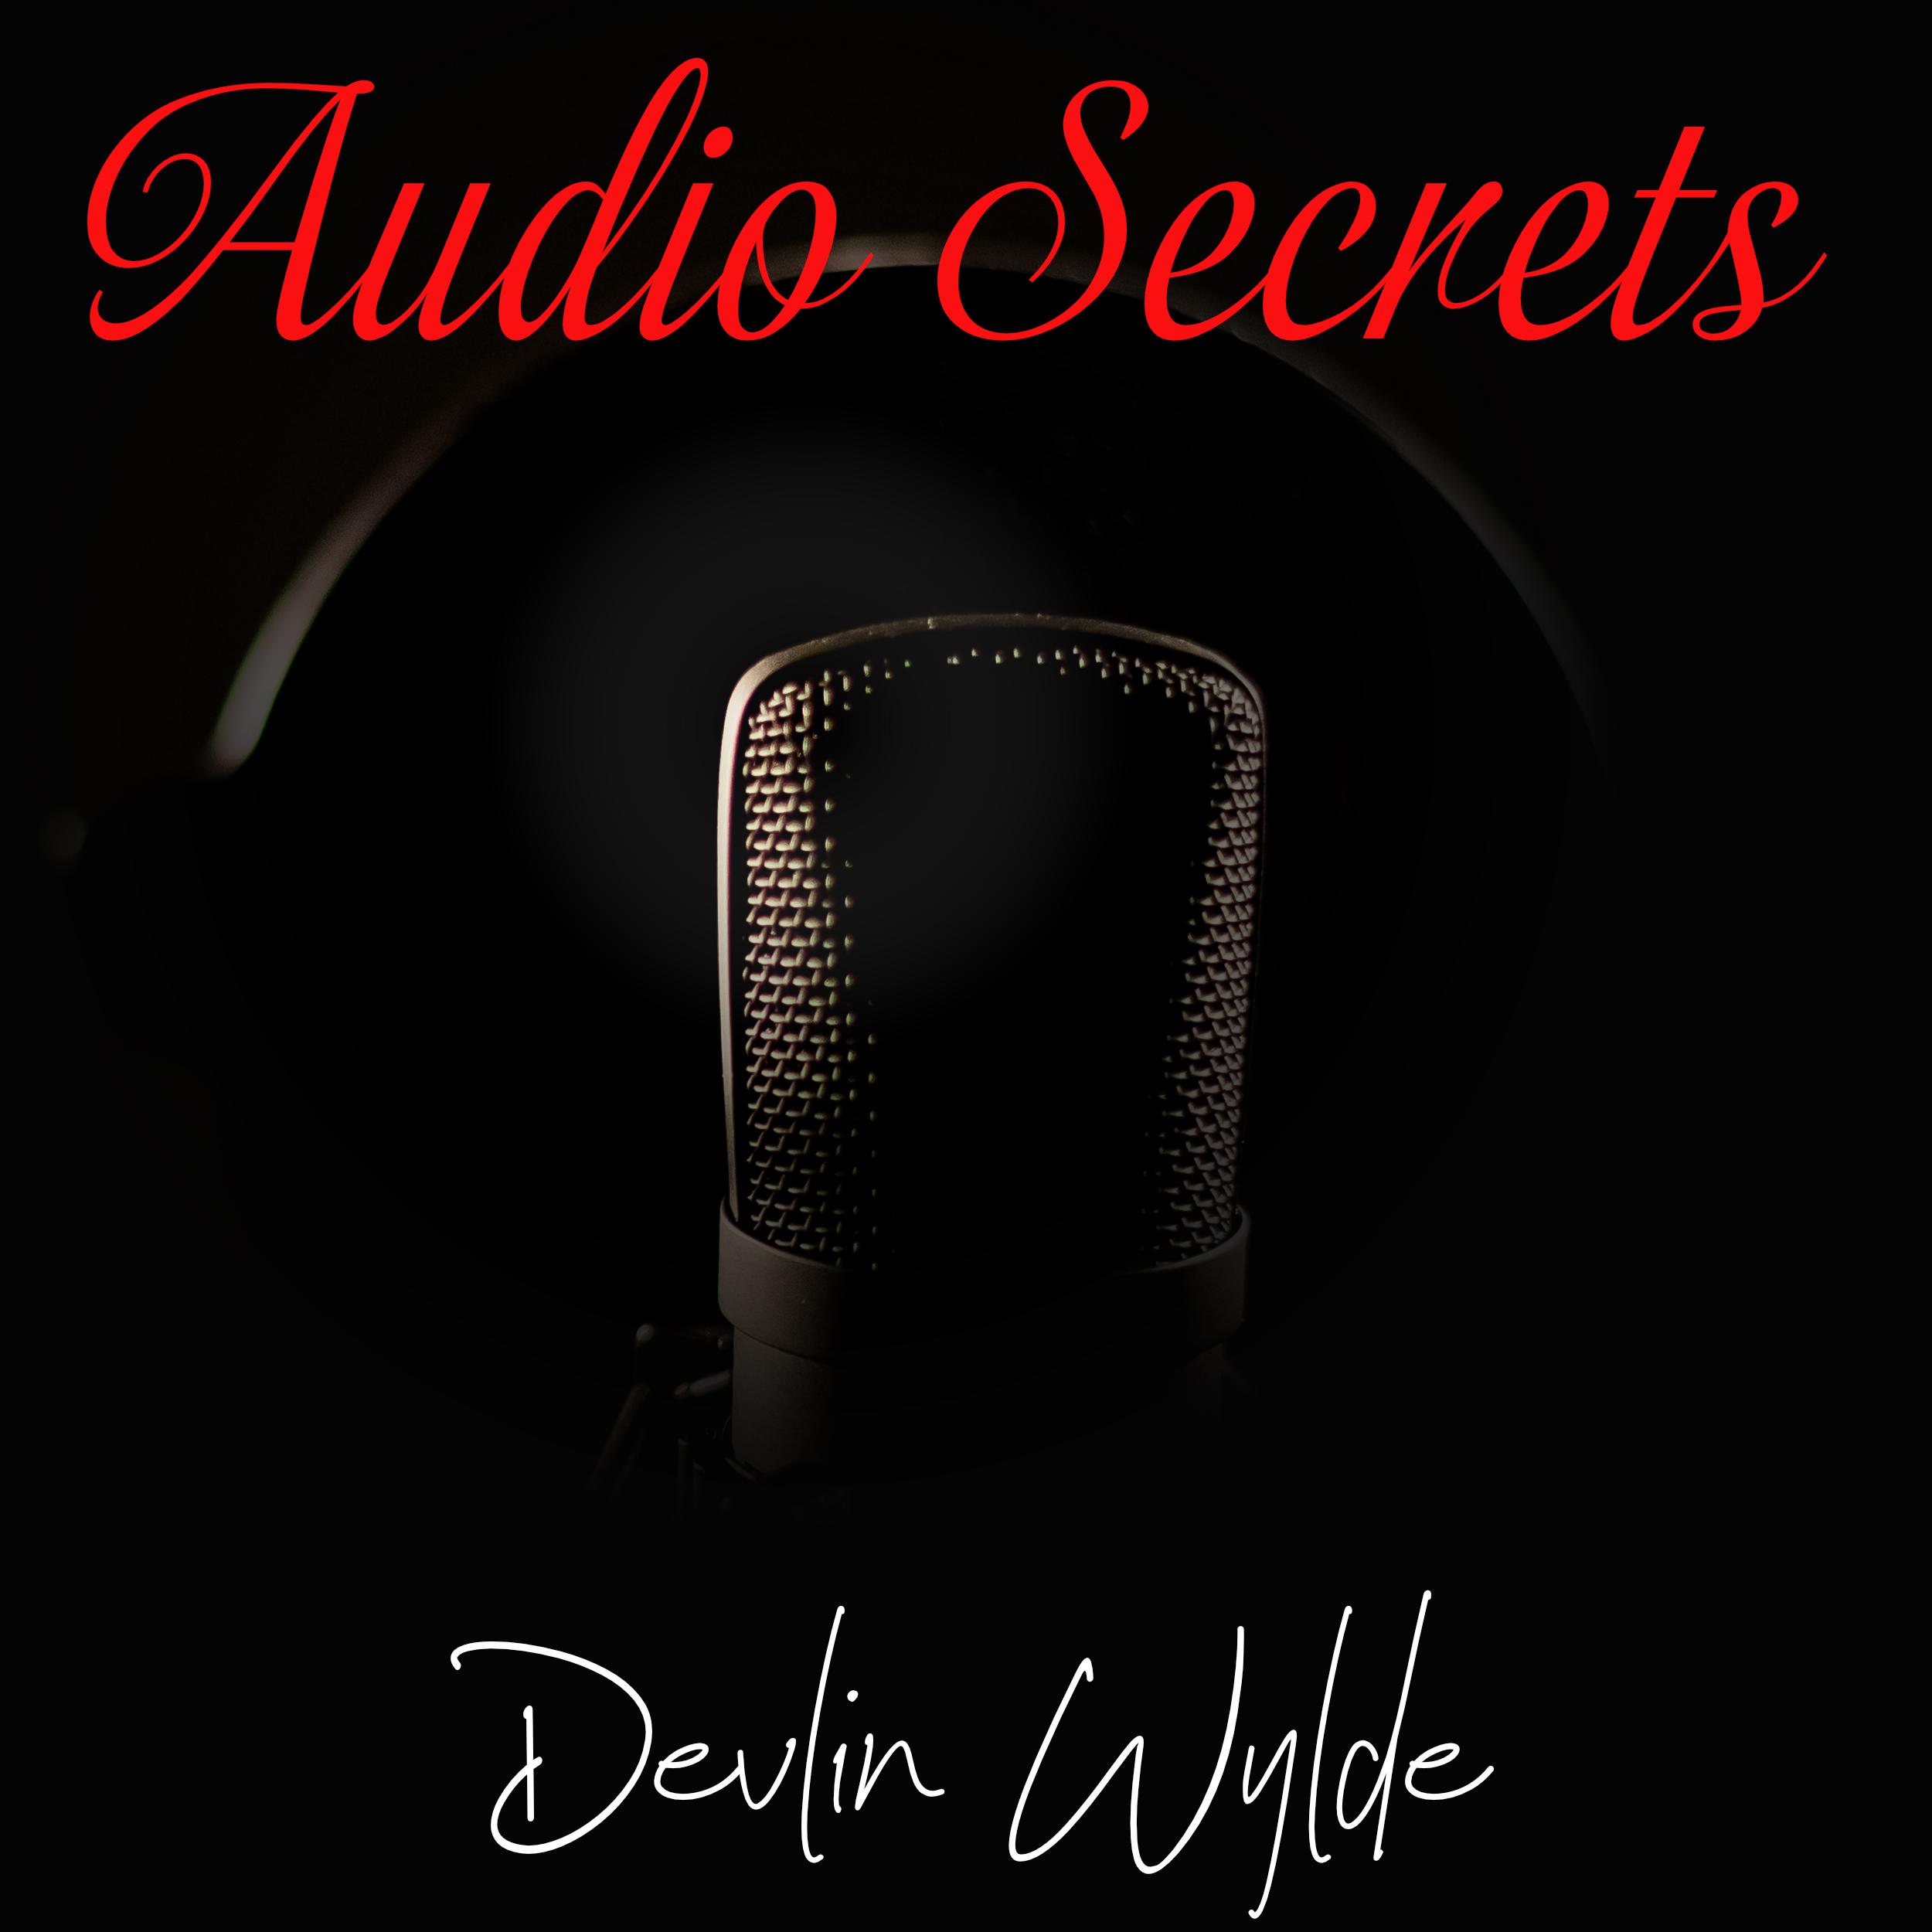 Audio Secrets - The Creation of Audiobooks